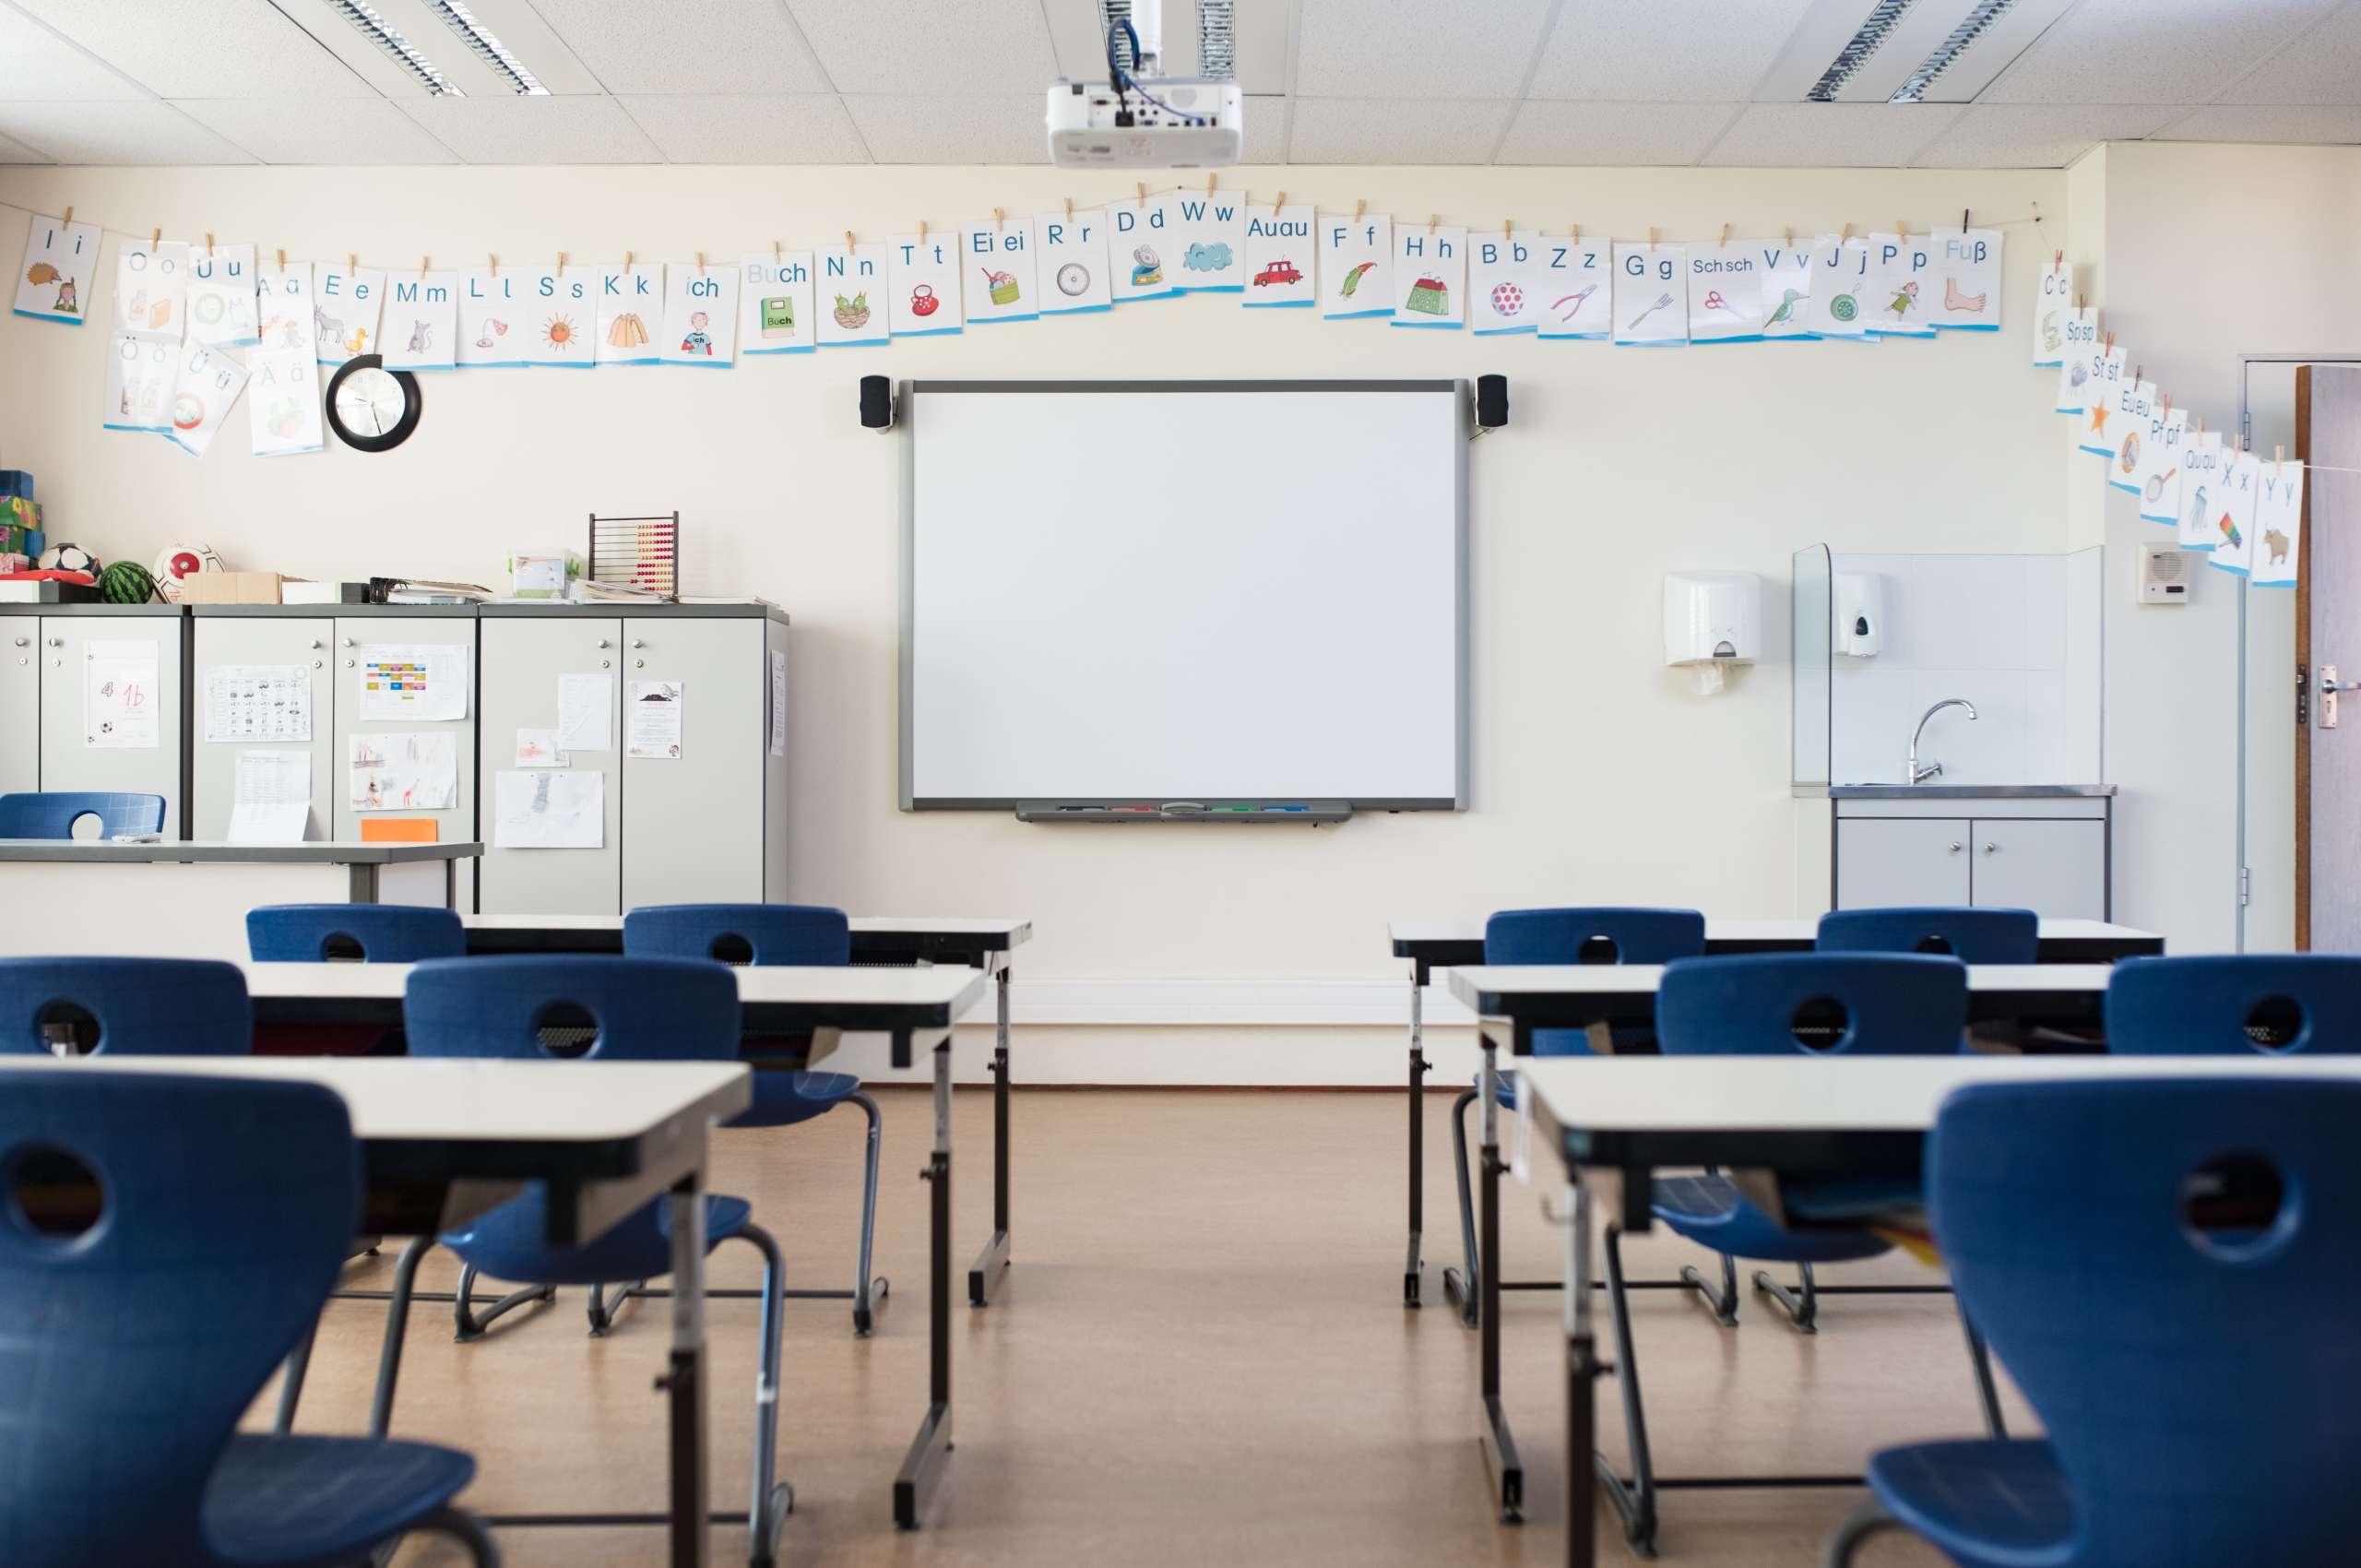 Leeres Klassenzimmer mit Whiteboard.